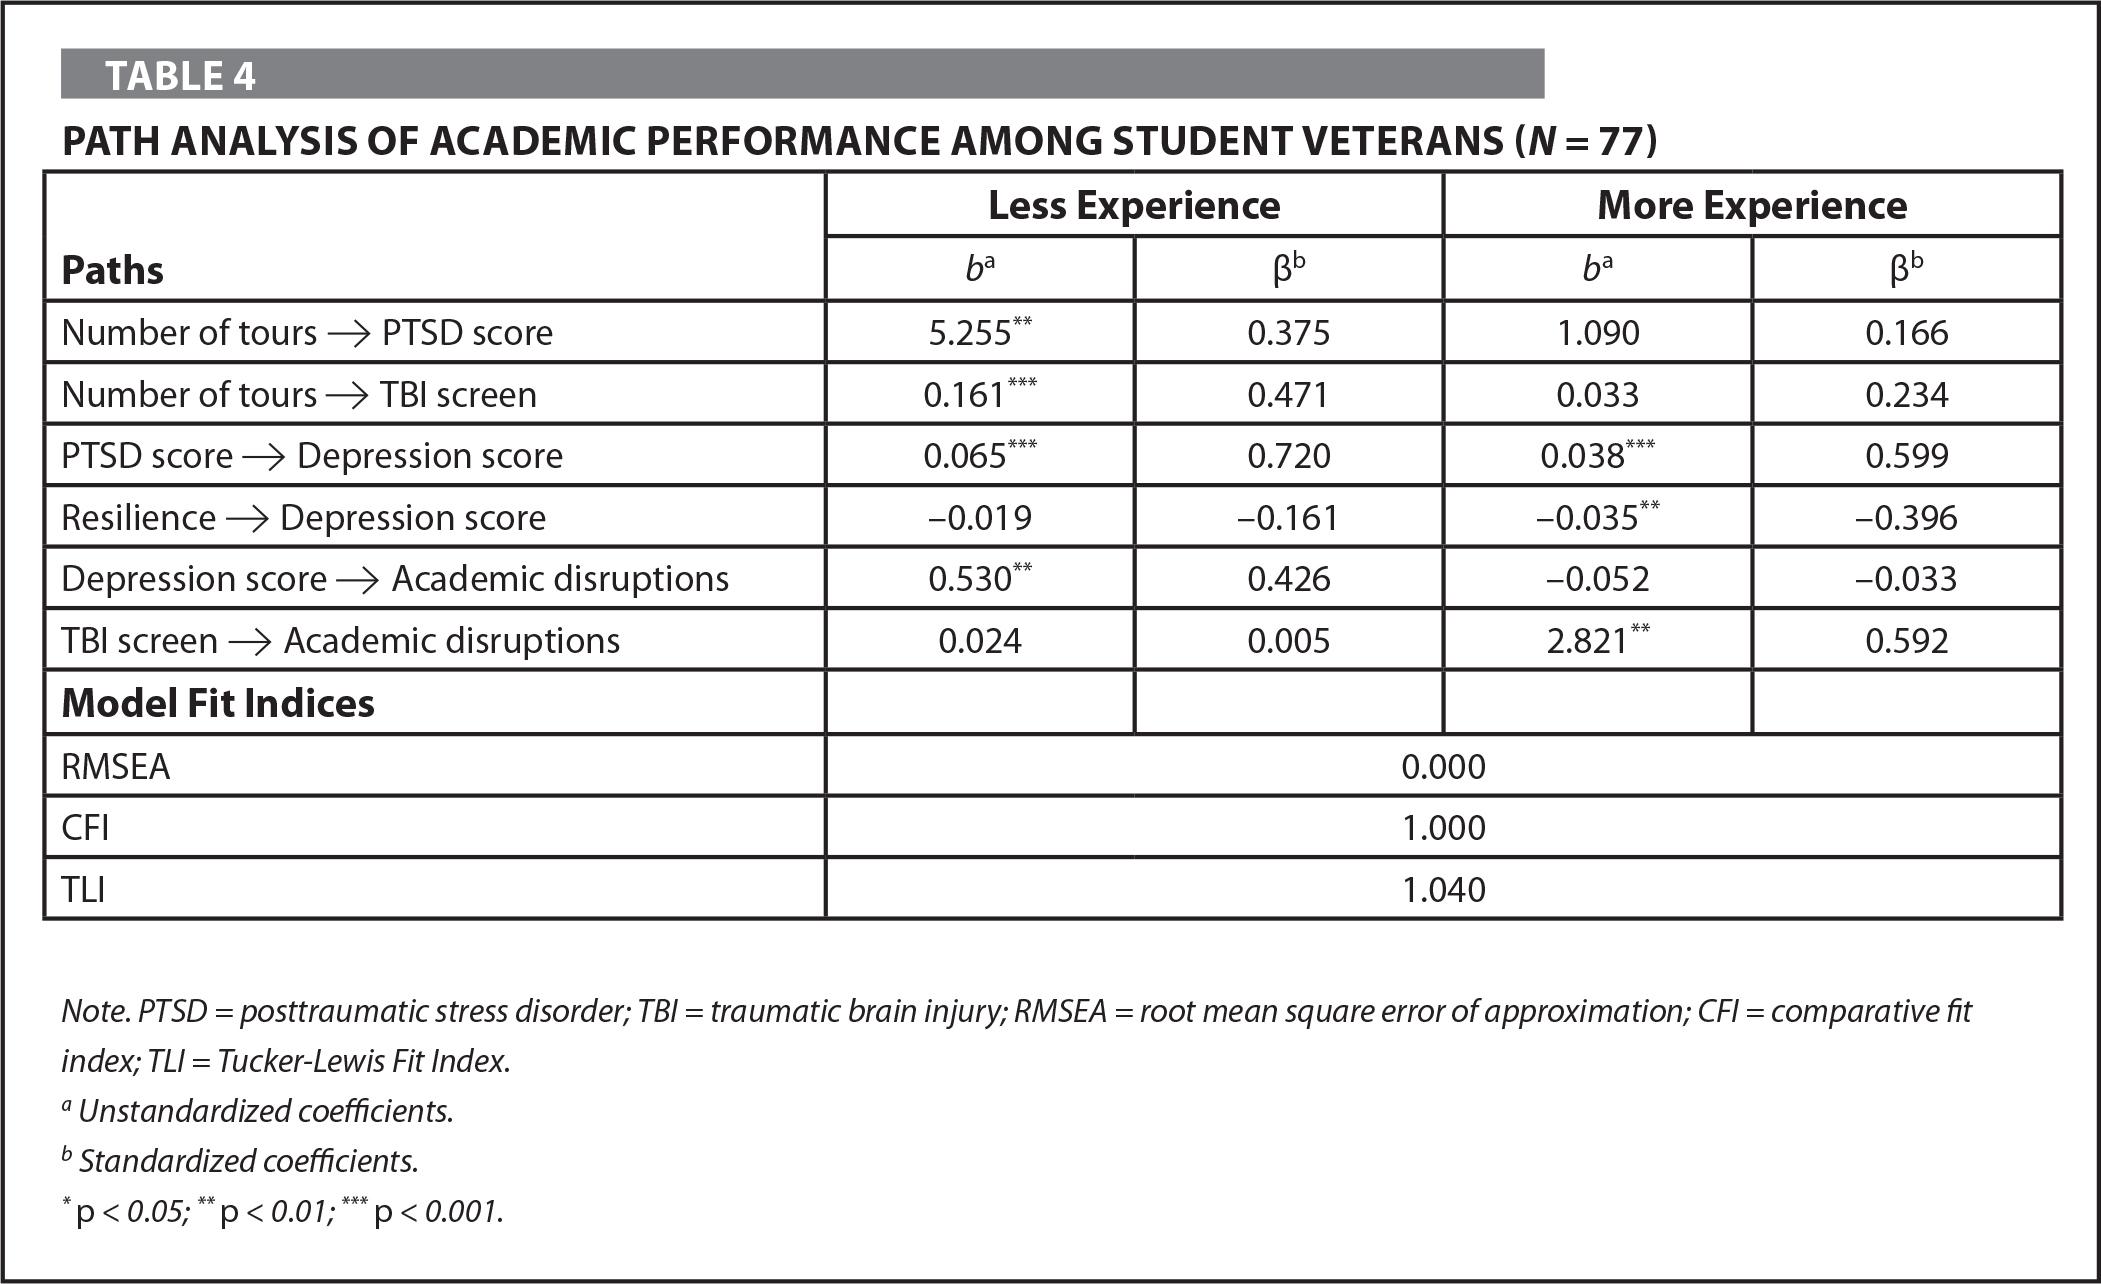 Path Analysis of Academic Performance Among Student Veterans (N = 77)